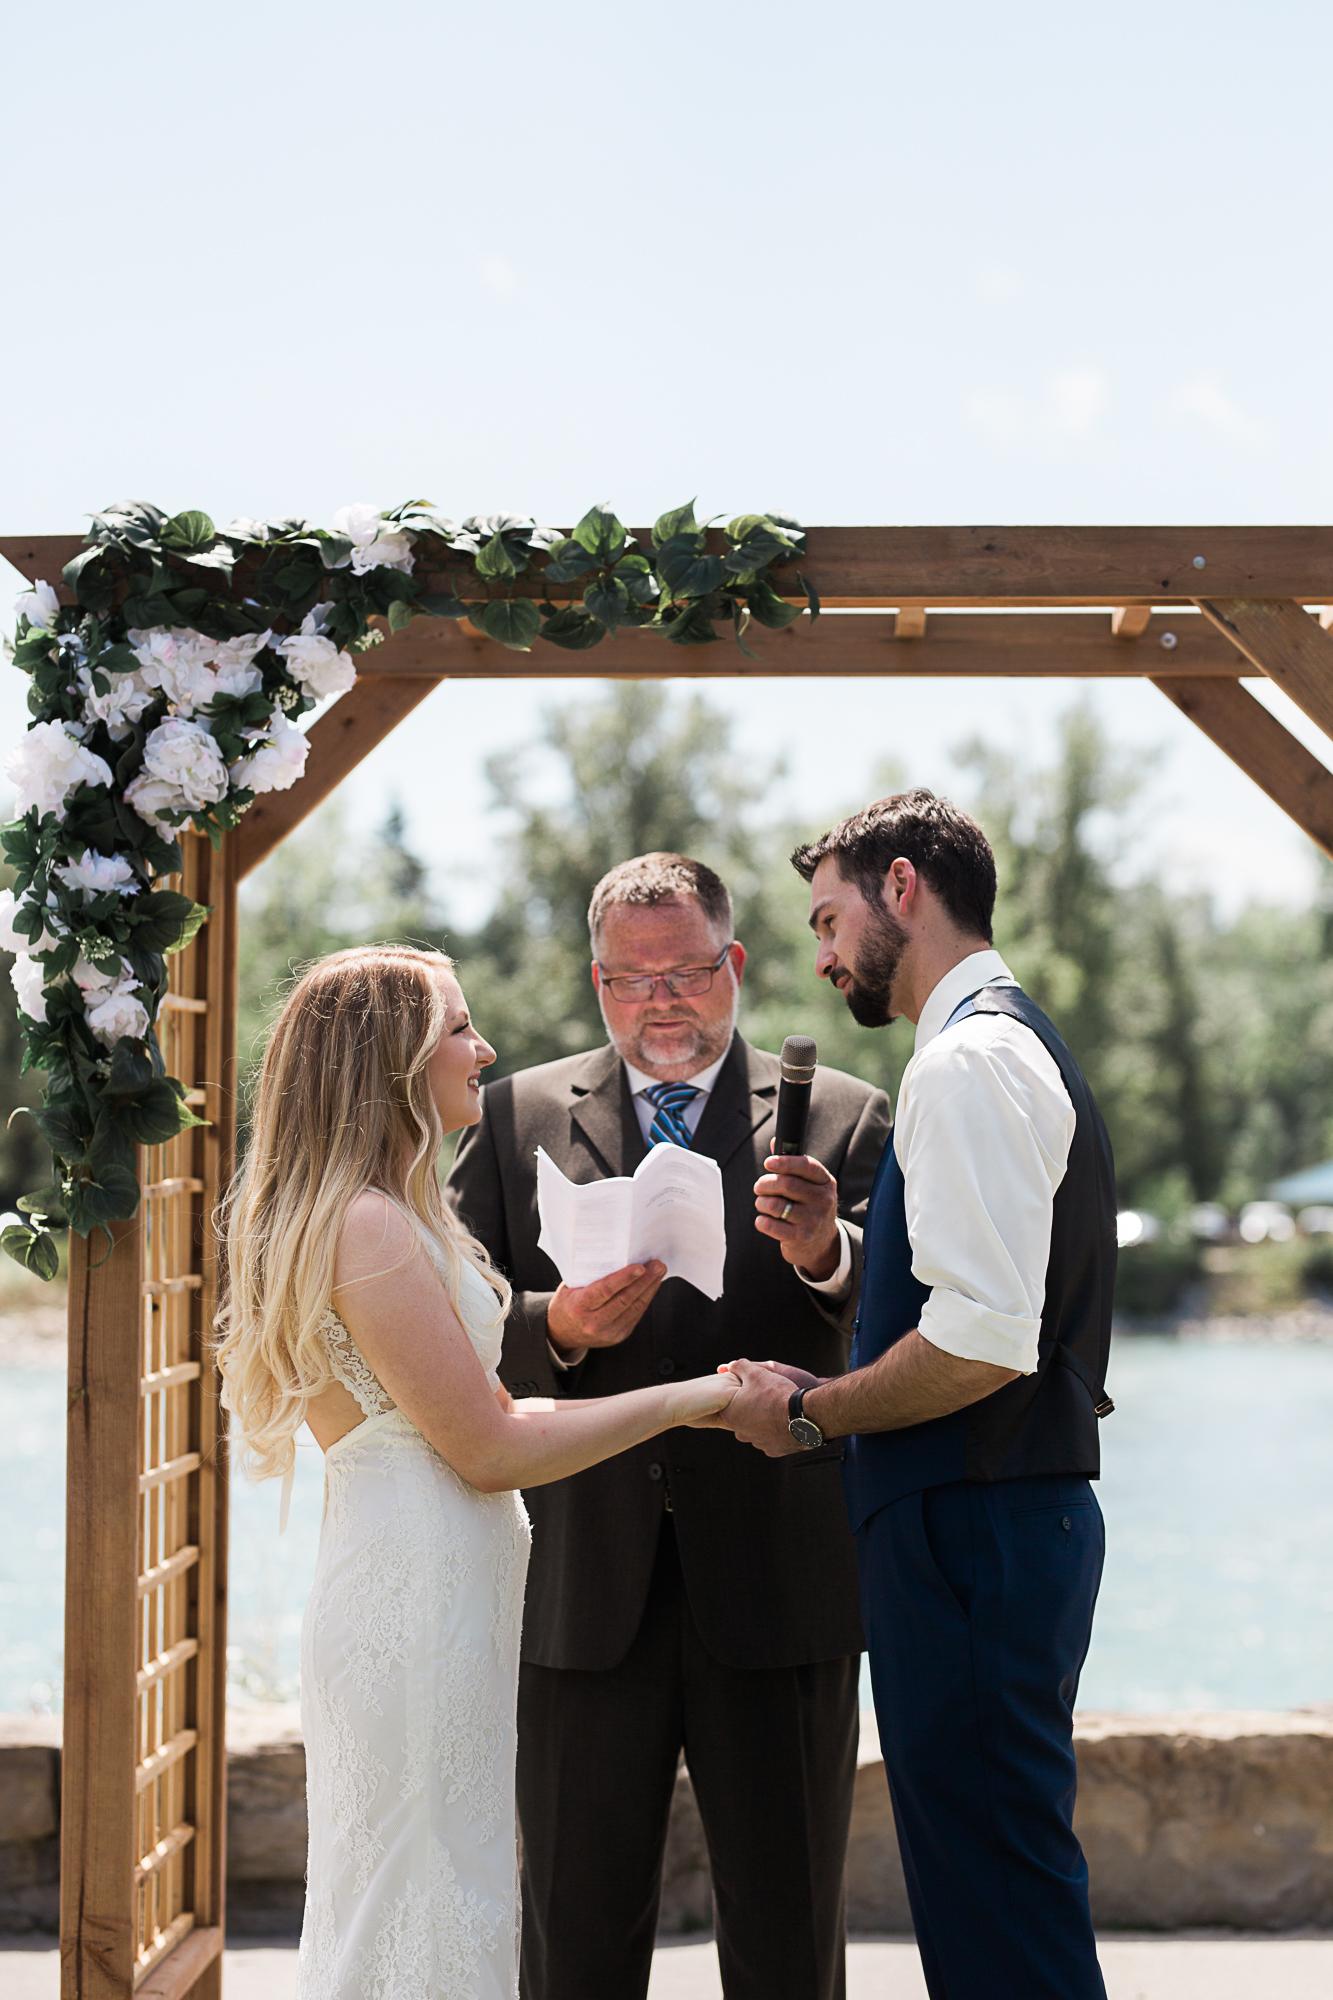 Baker-park-wedding-AC-34.jpg